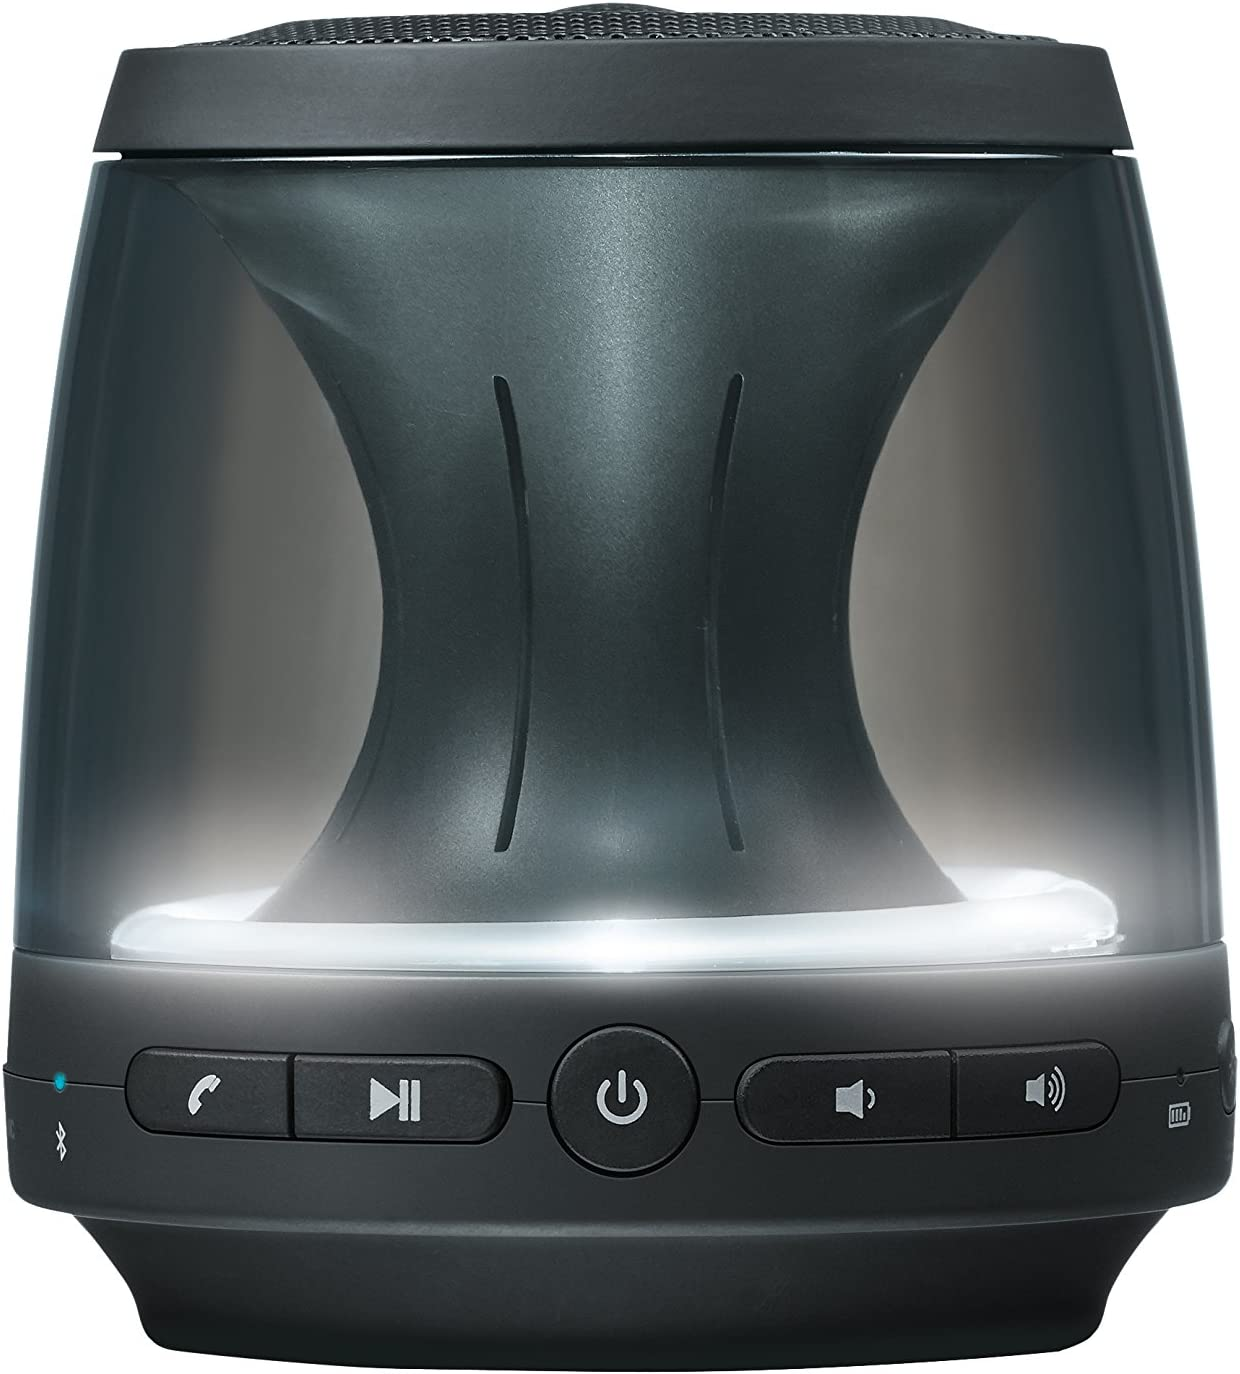 LG PH1 - Altavoz portátil (Bluetooth, sonido 360, micrófono, microUSB) Color negro